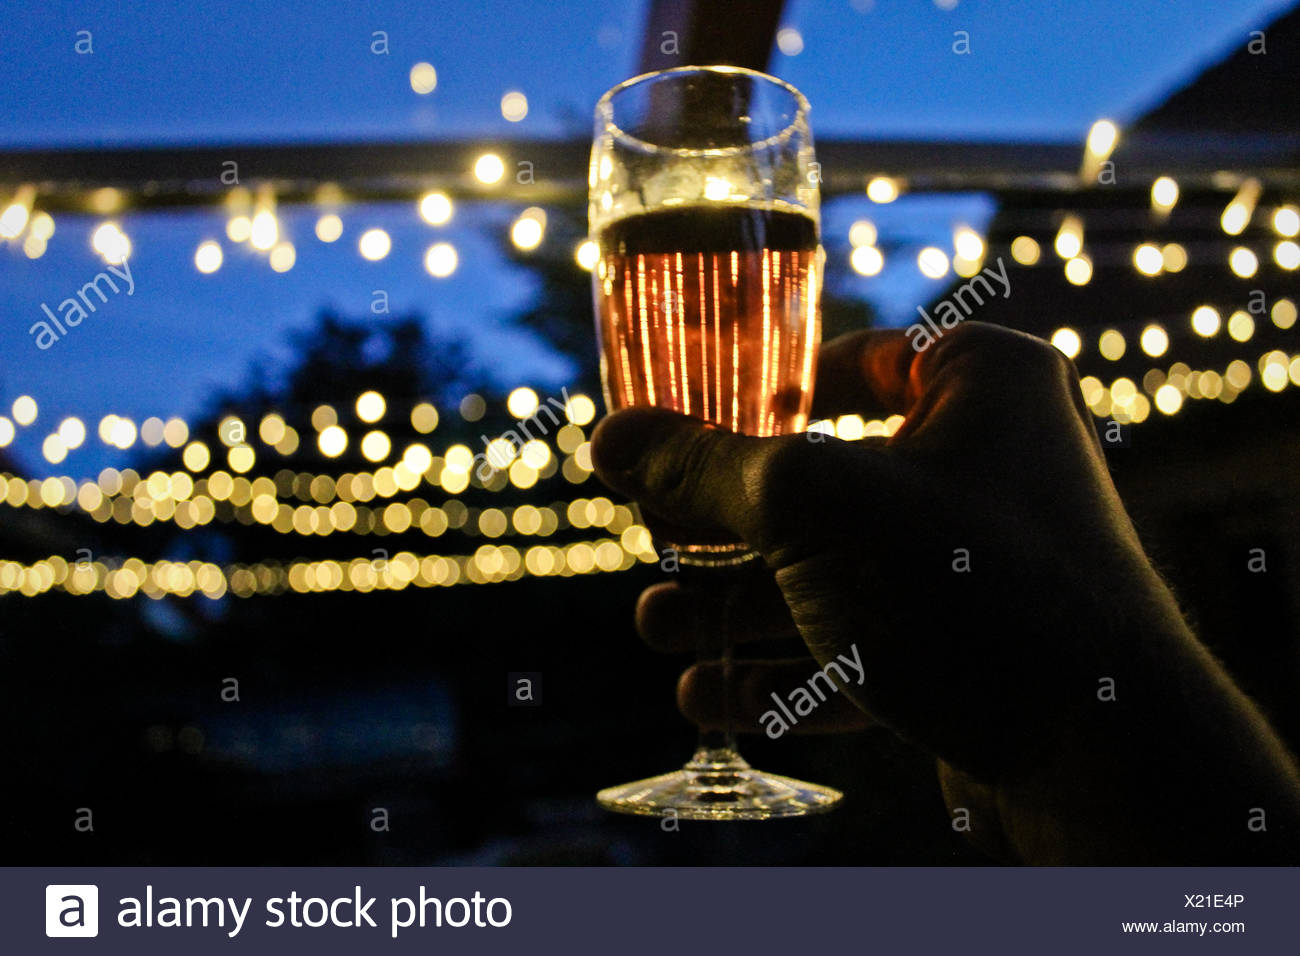 Hand Raising Champagne Flute - Stock Image